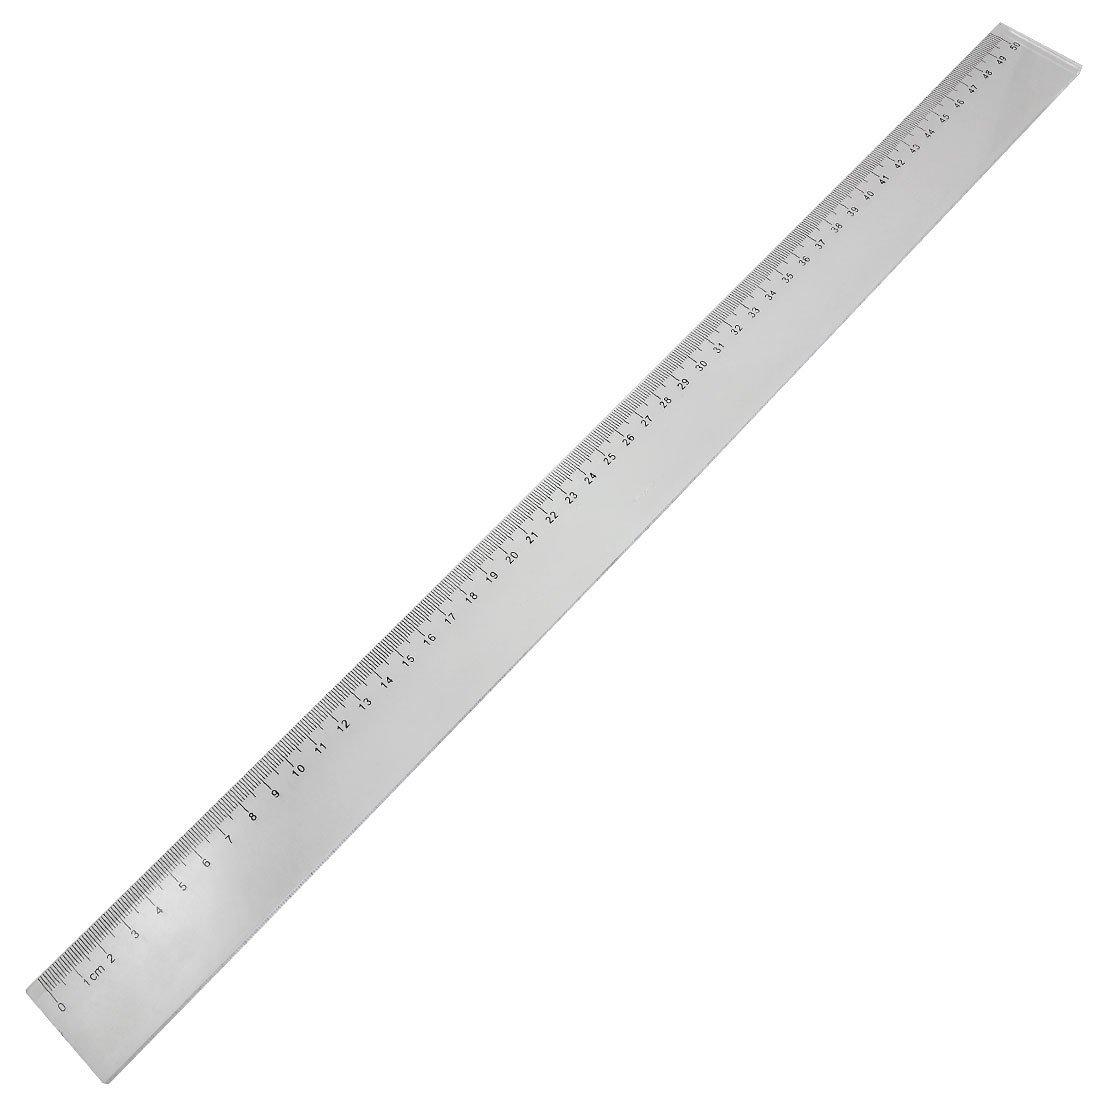 R 50cm Clear Plastic Measuring Long Straight Centimeter Ruler TOOGOO